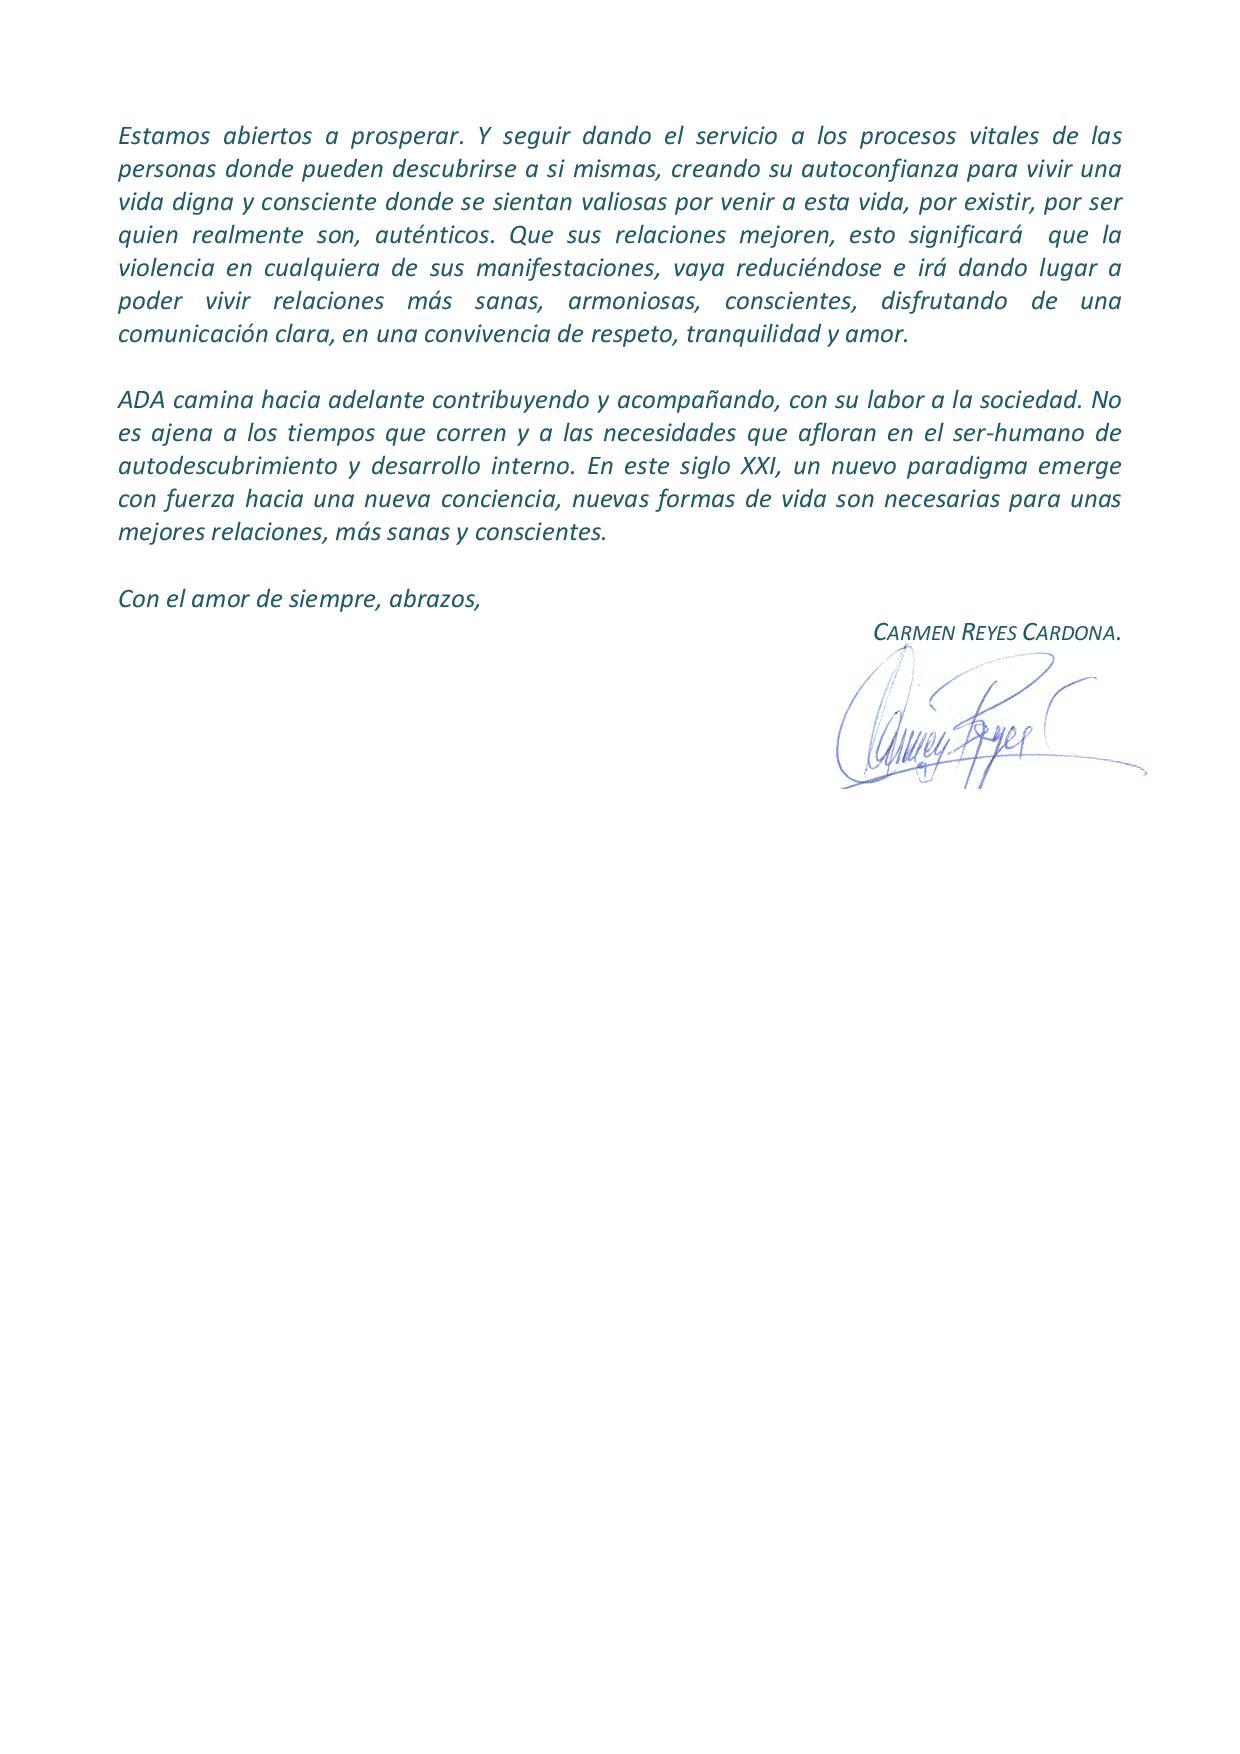 Carta de Fundadora para WEB.2